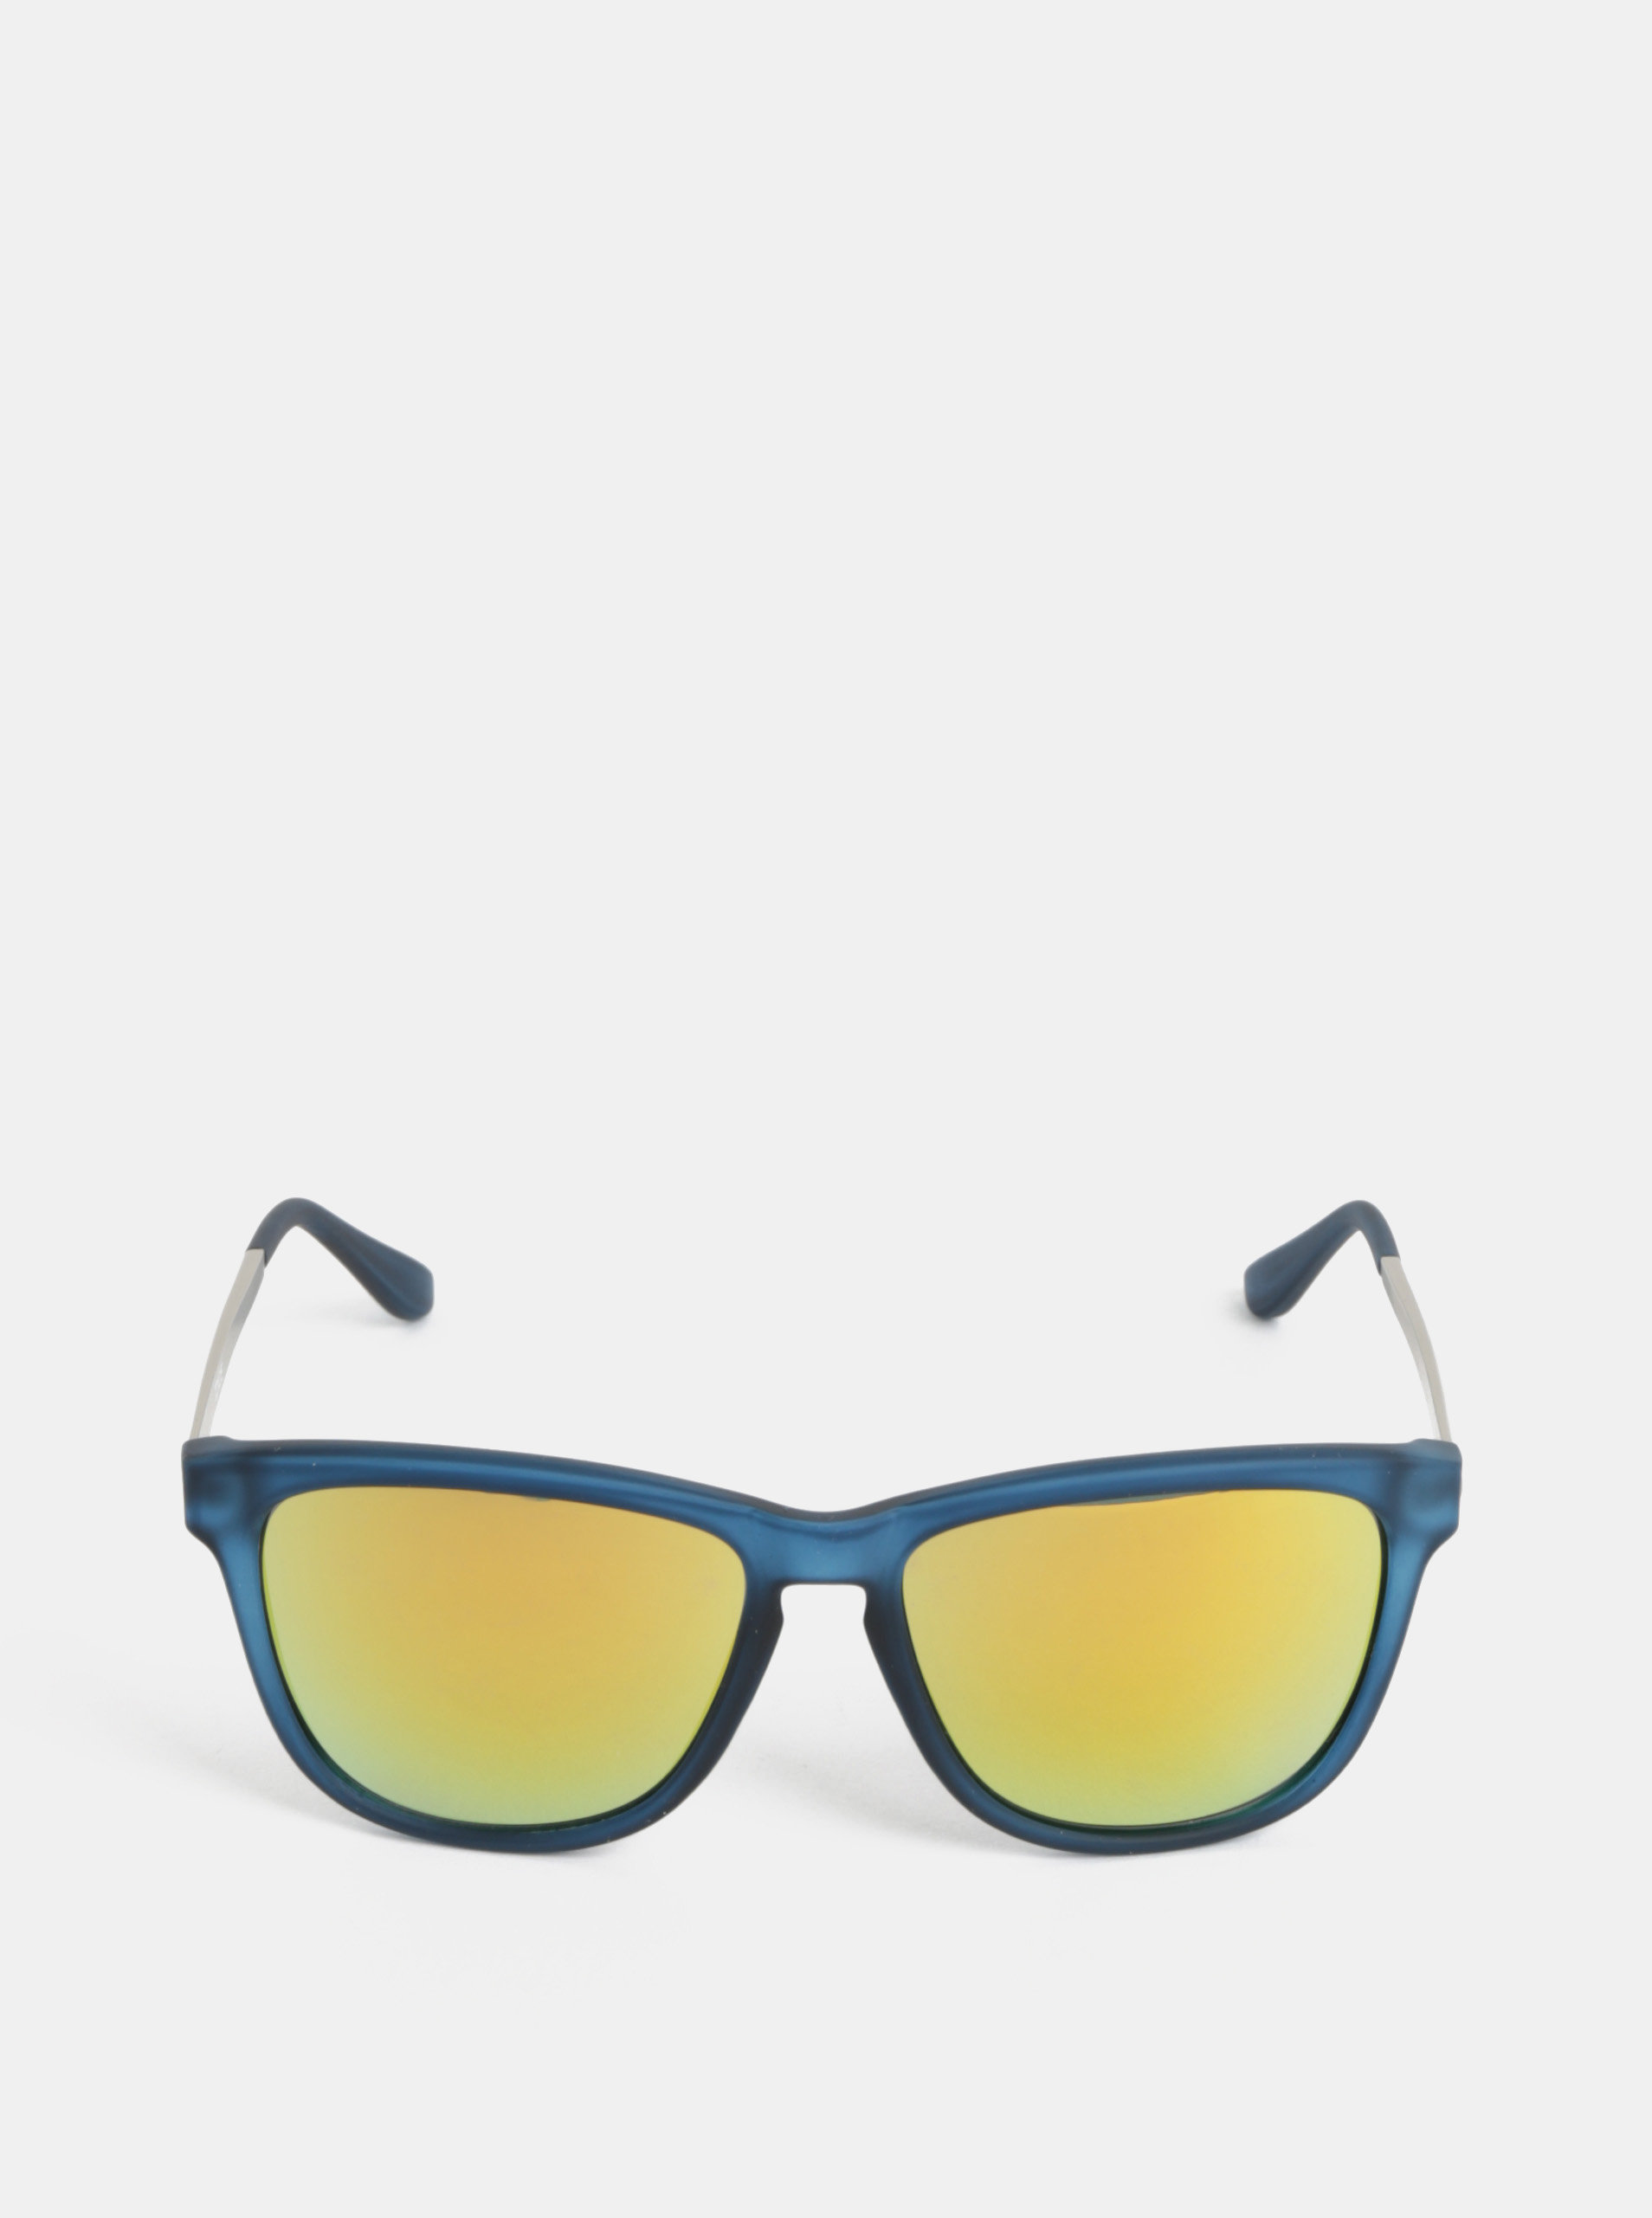 f9c813ef3 Modré pánske slnečné okuliare so zrkadlovými sklami Dice | ZOOT.sk